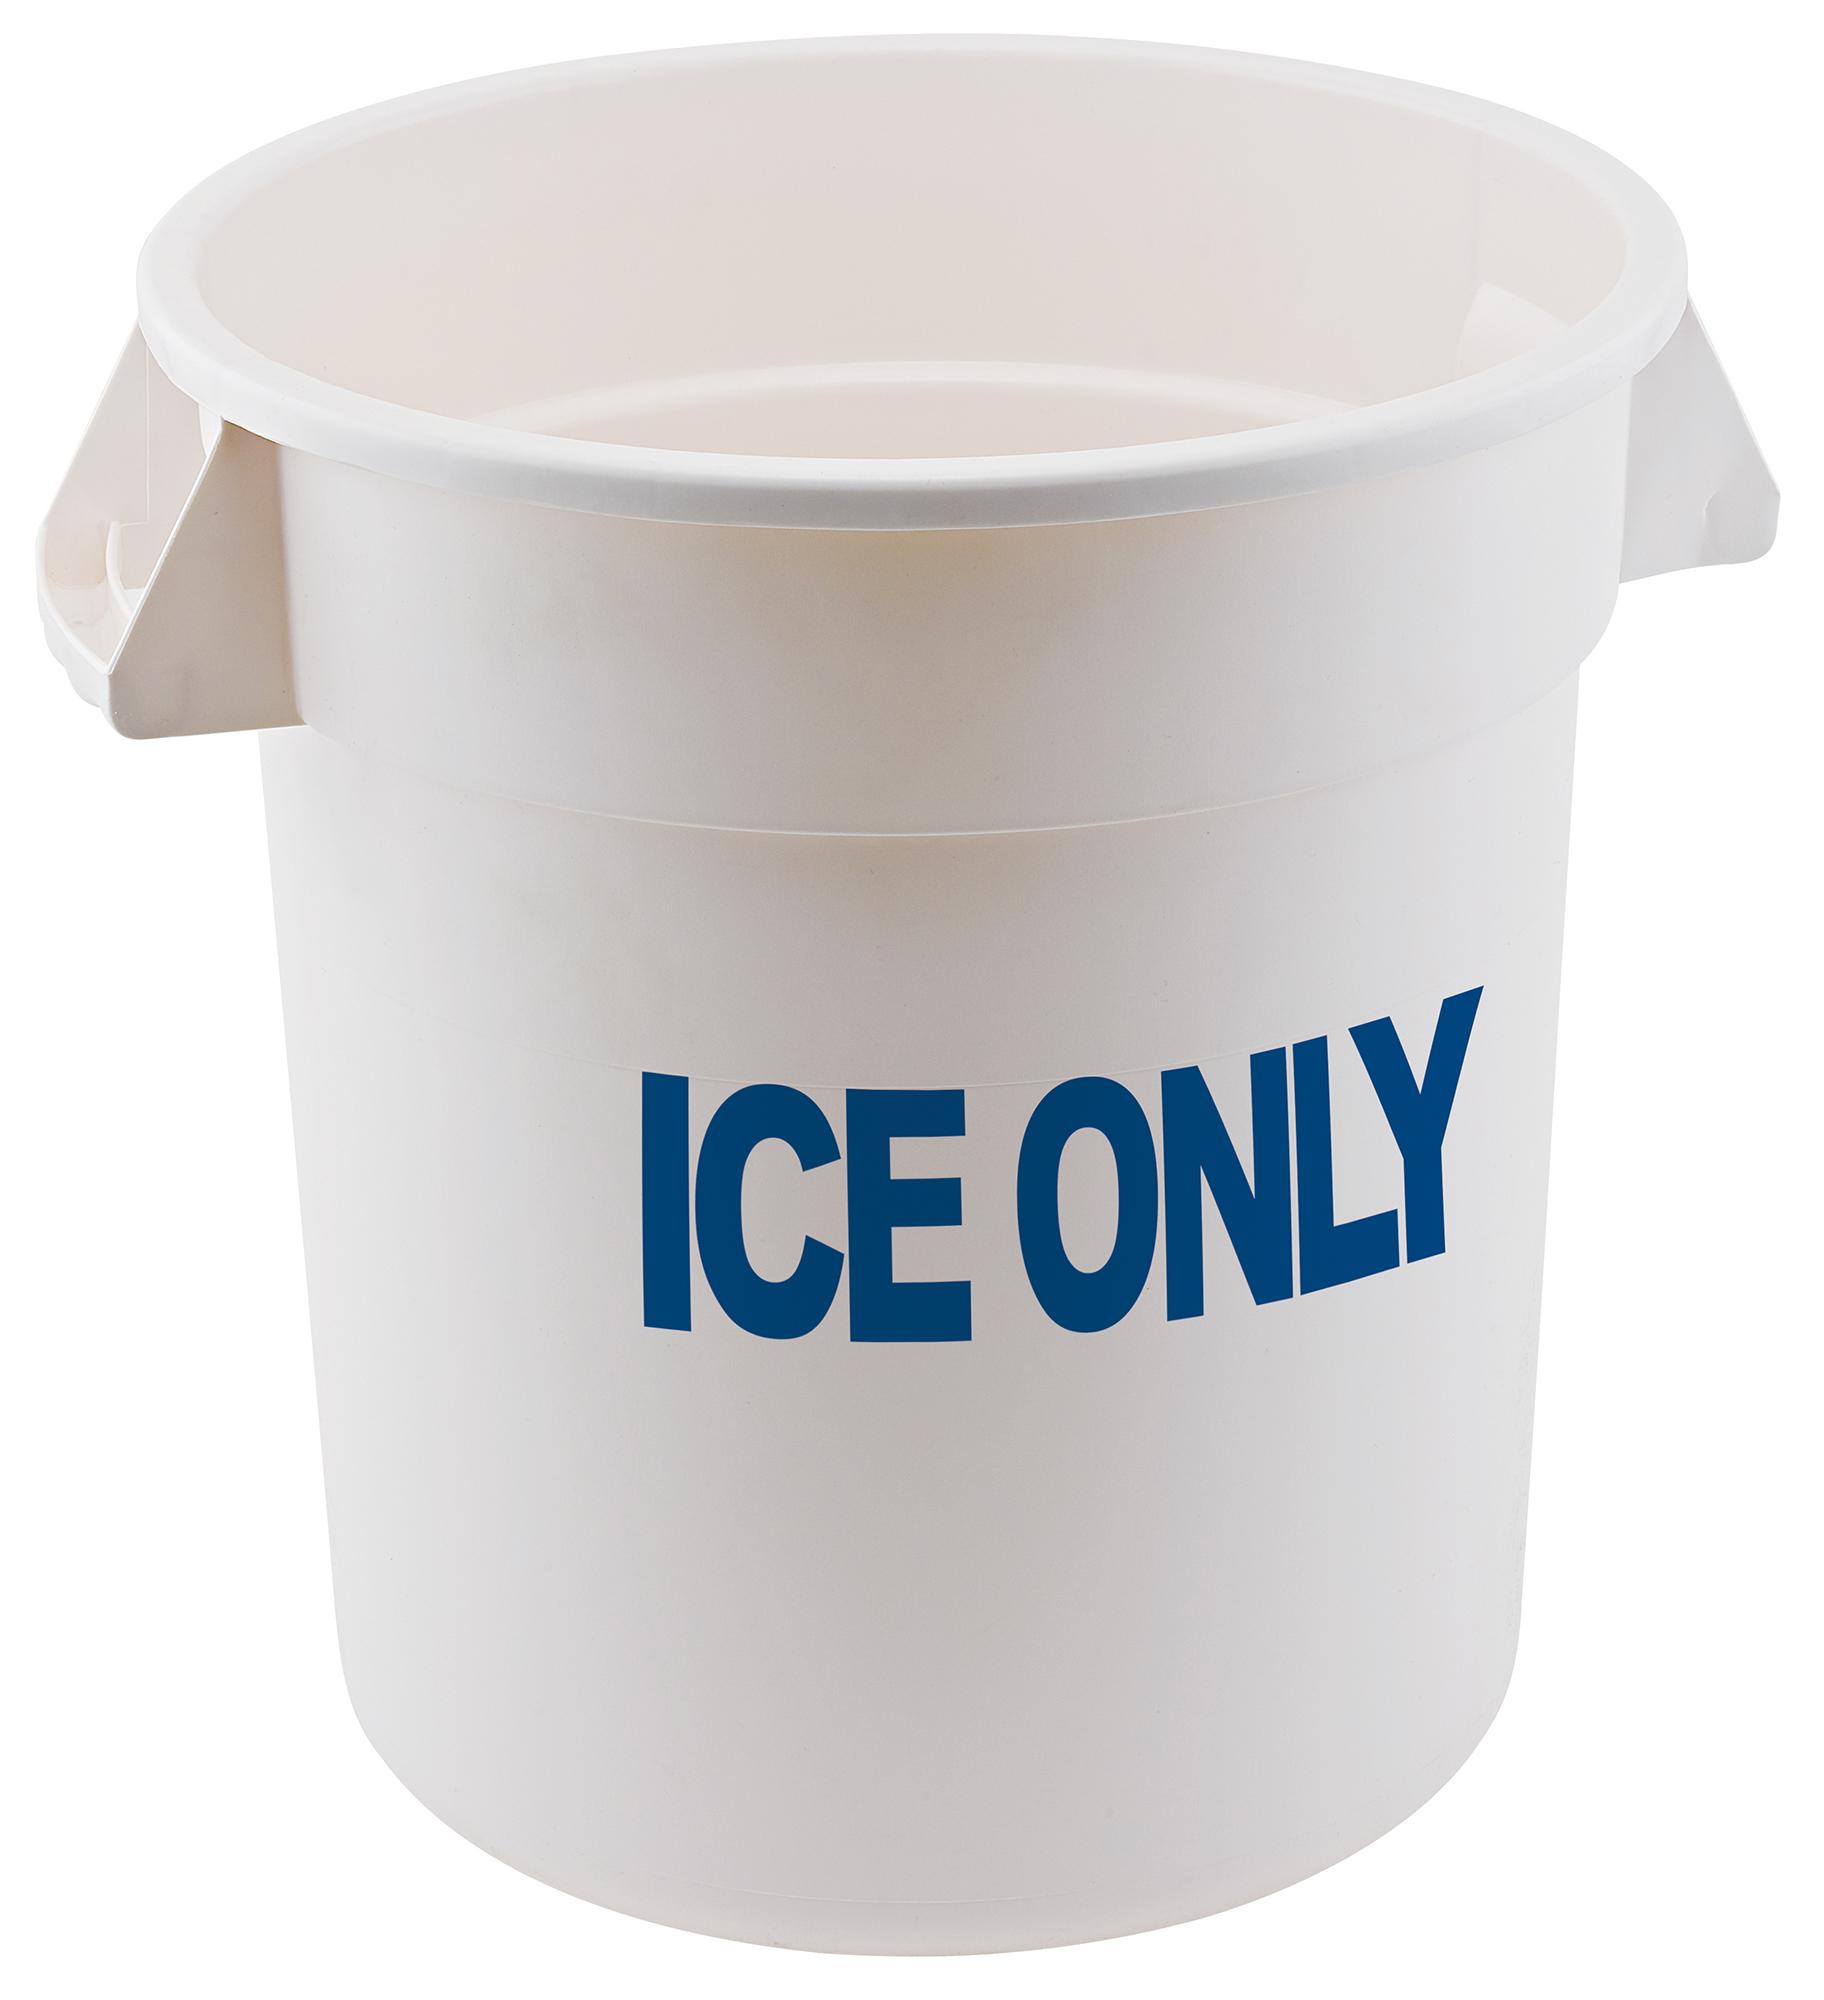 Winco FCW-20ICE ice handling bin